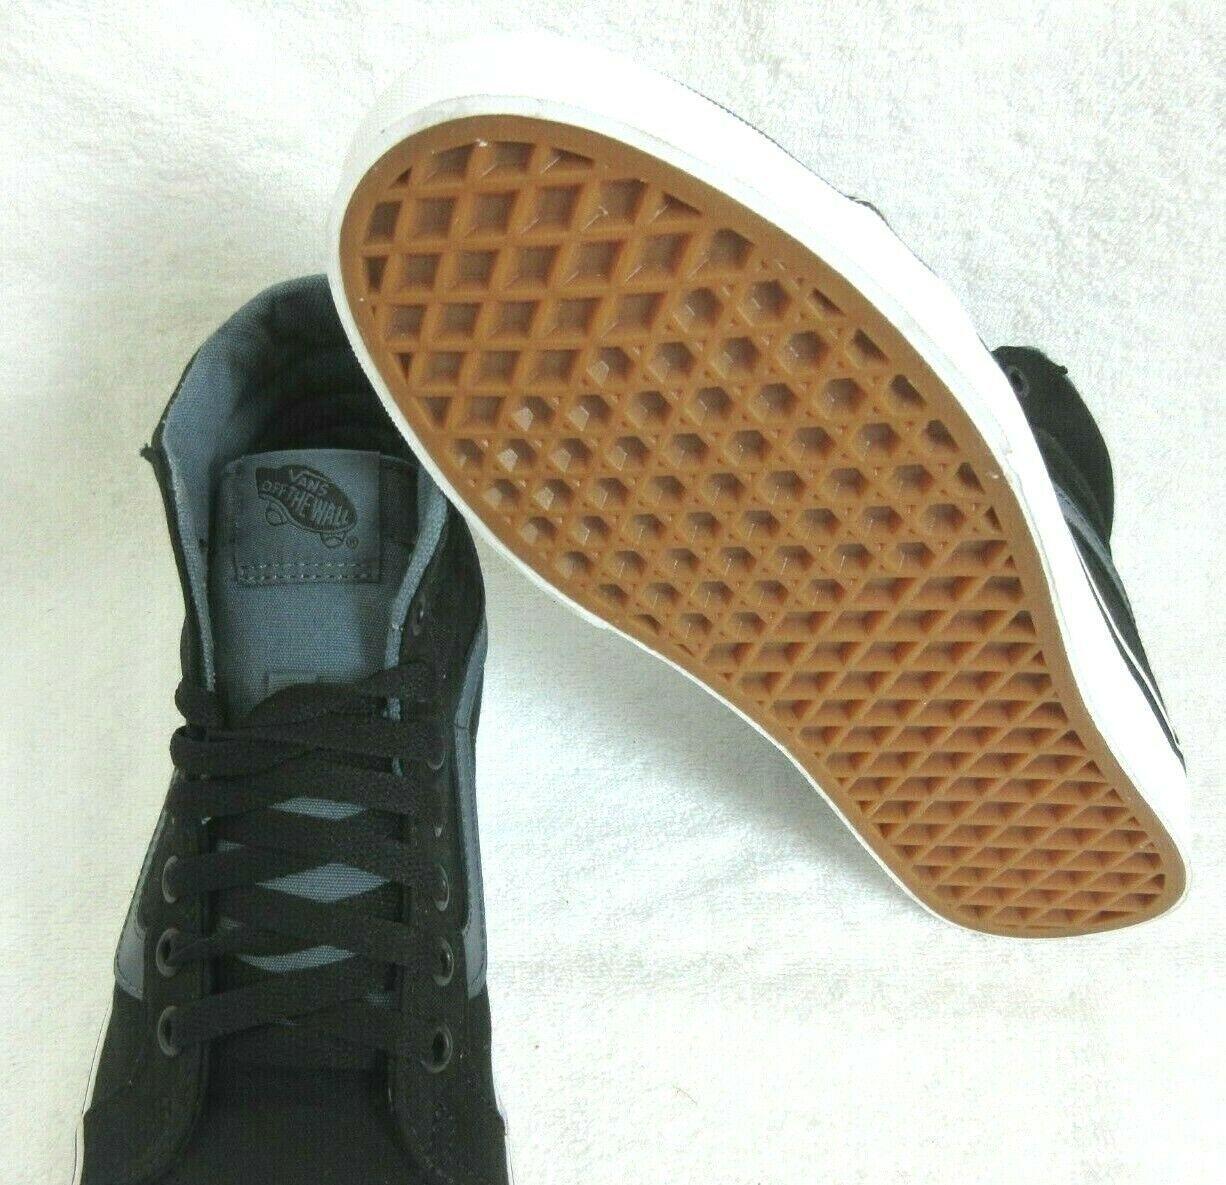 Vans Womens Sk8-Hi Reissue Canvas Black Dark Slate Grey Skate Shoes Size 8 NWT